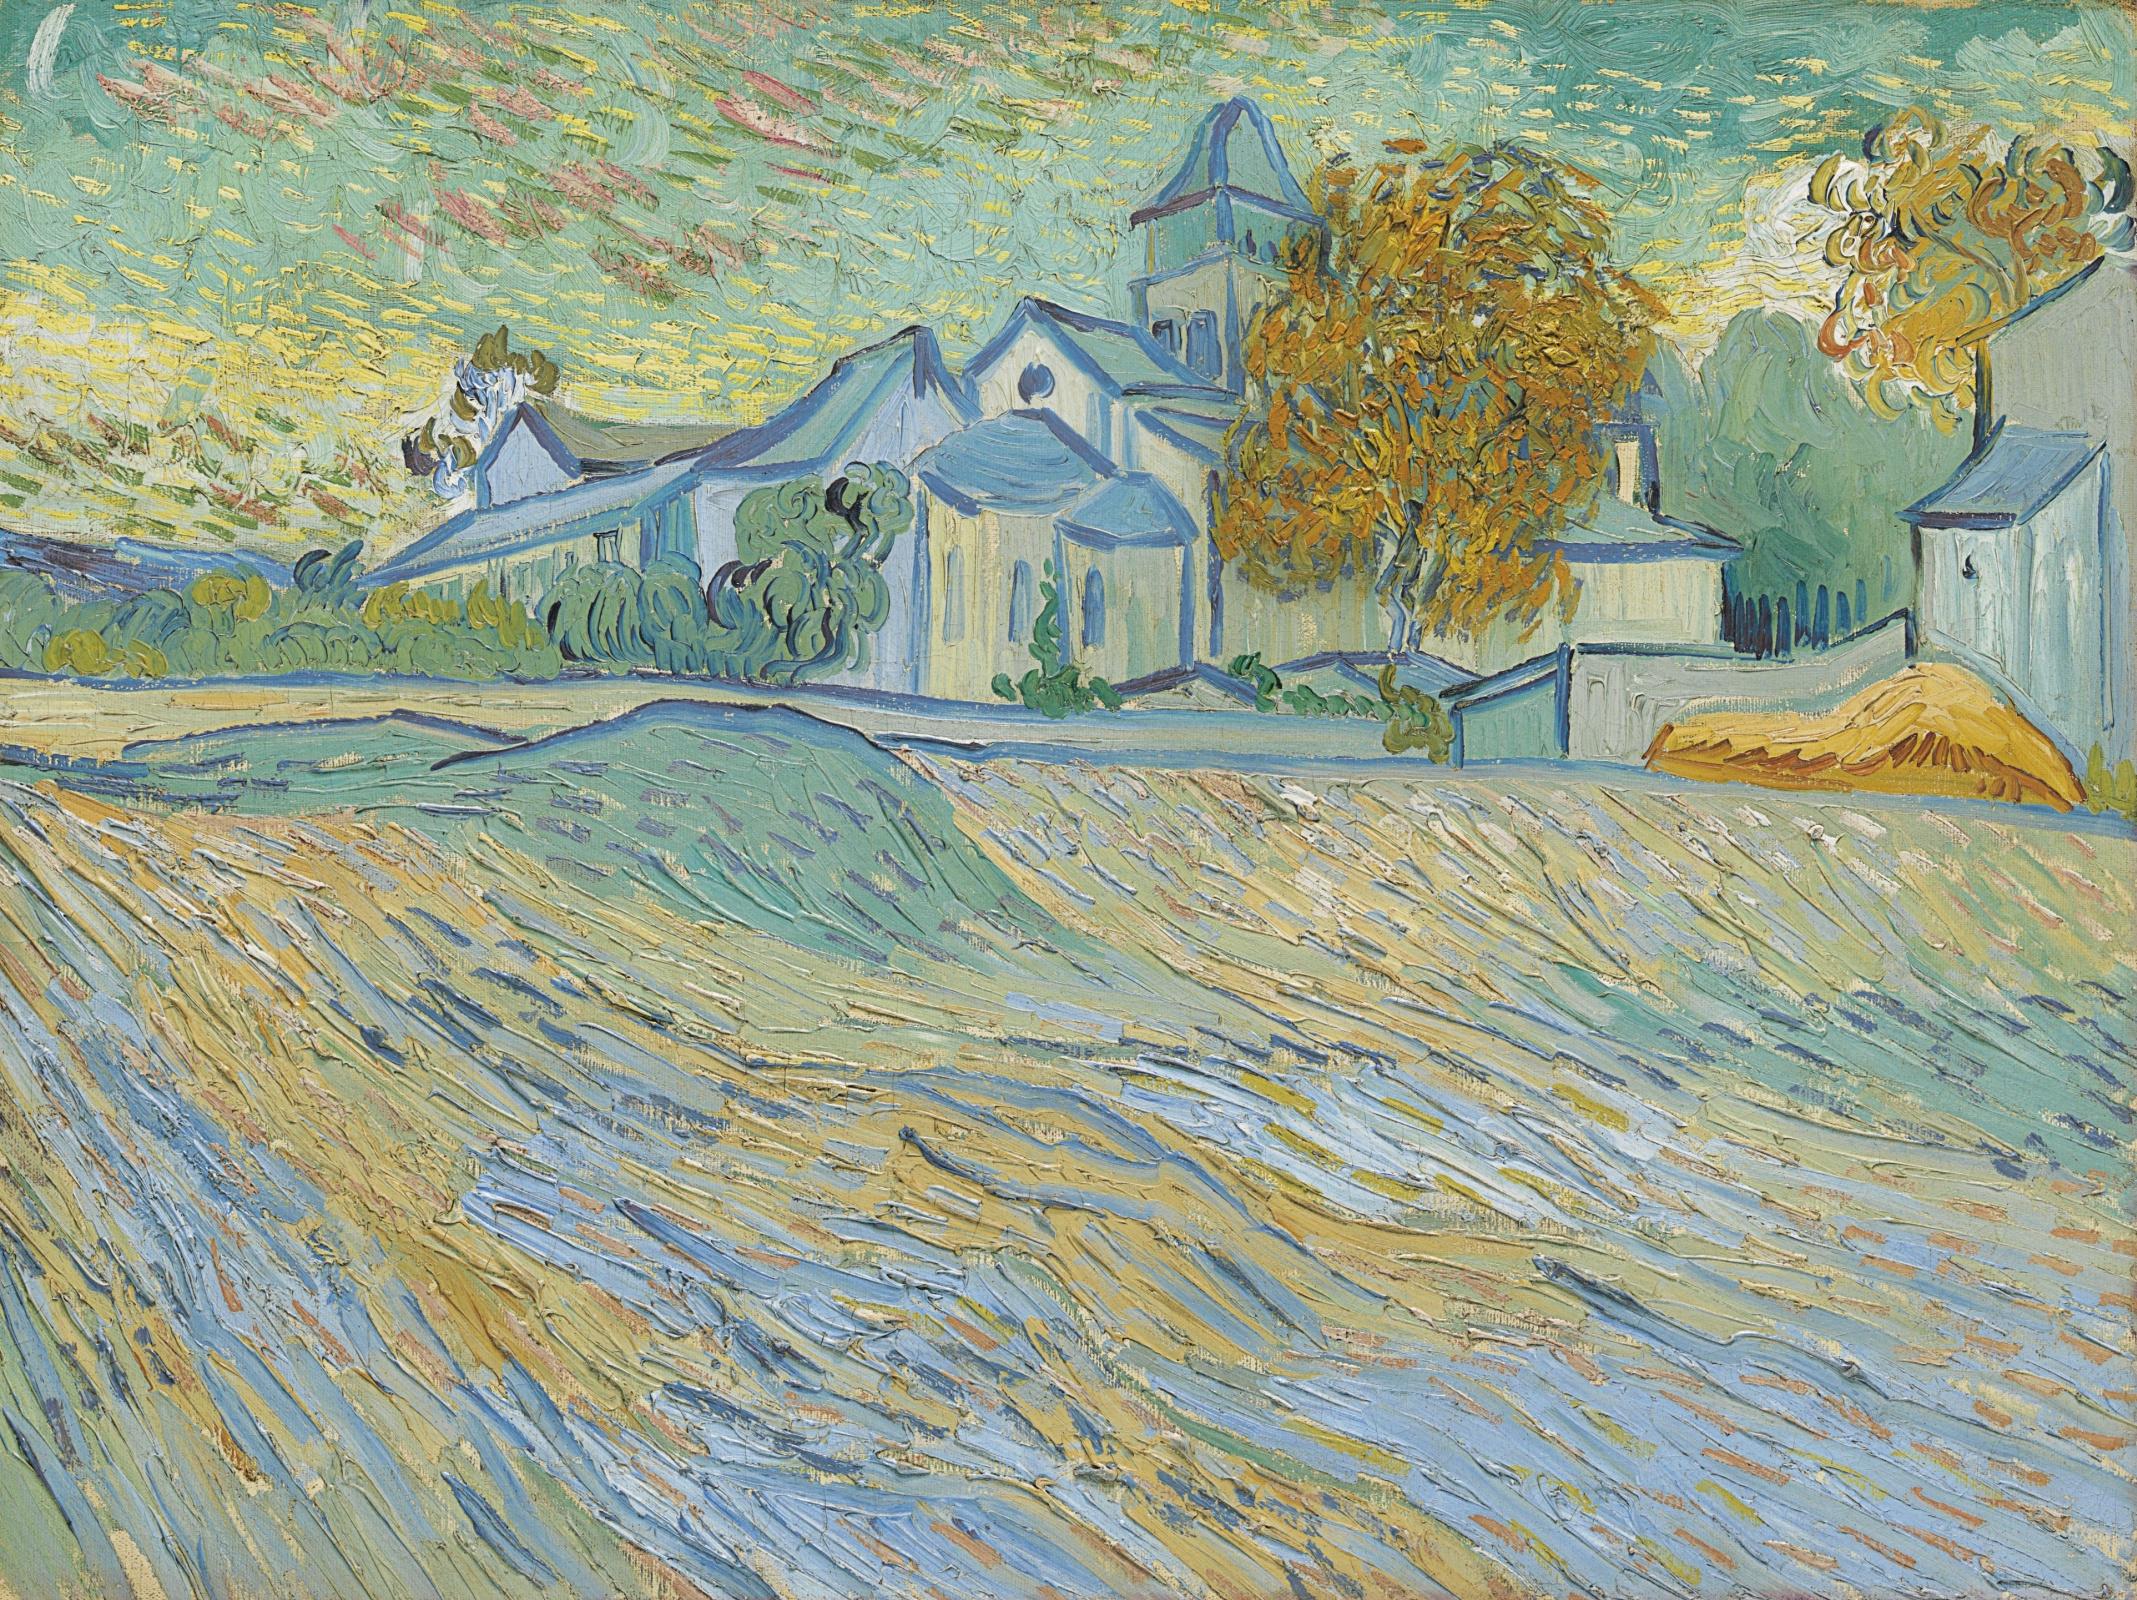 Винсент Ван Гог. Вид на приют и часовню в Сен-Реми